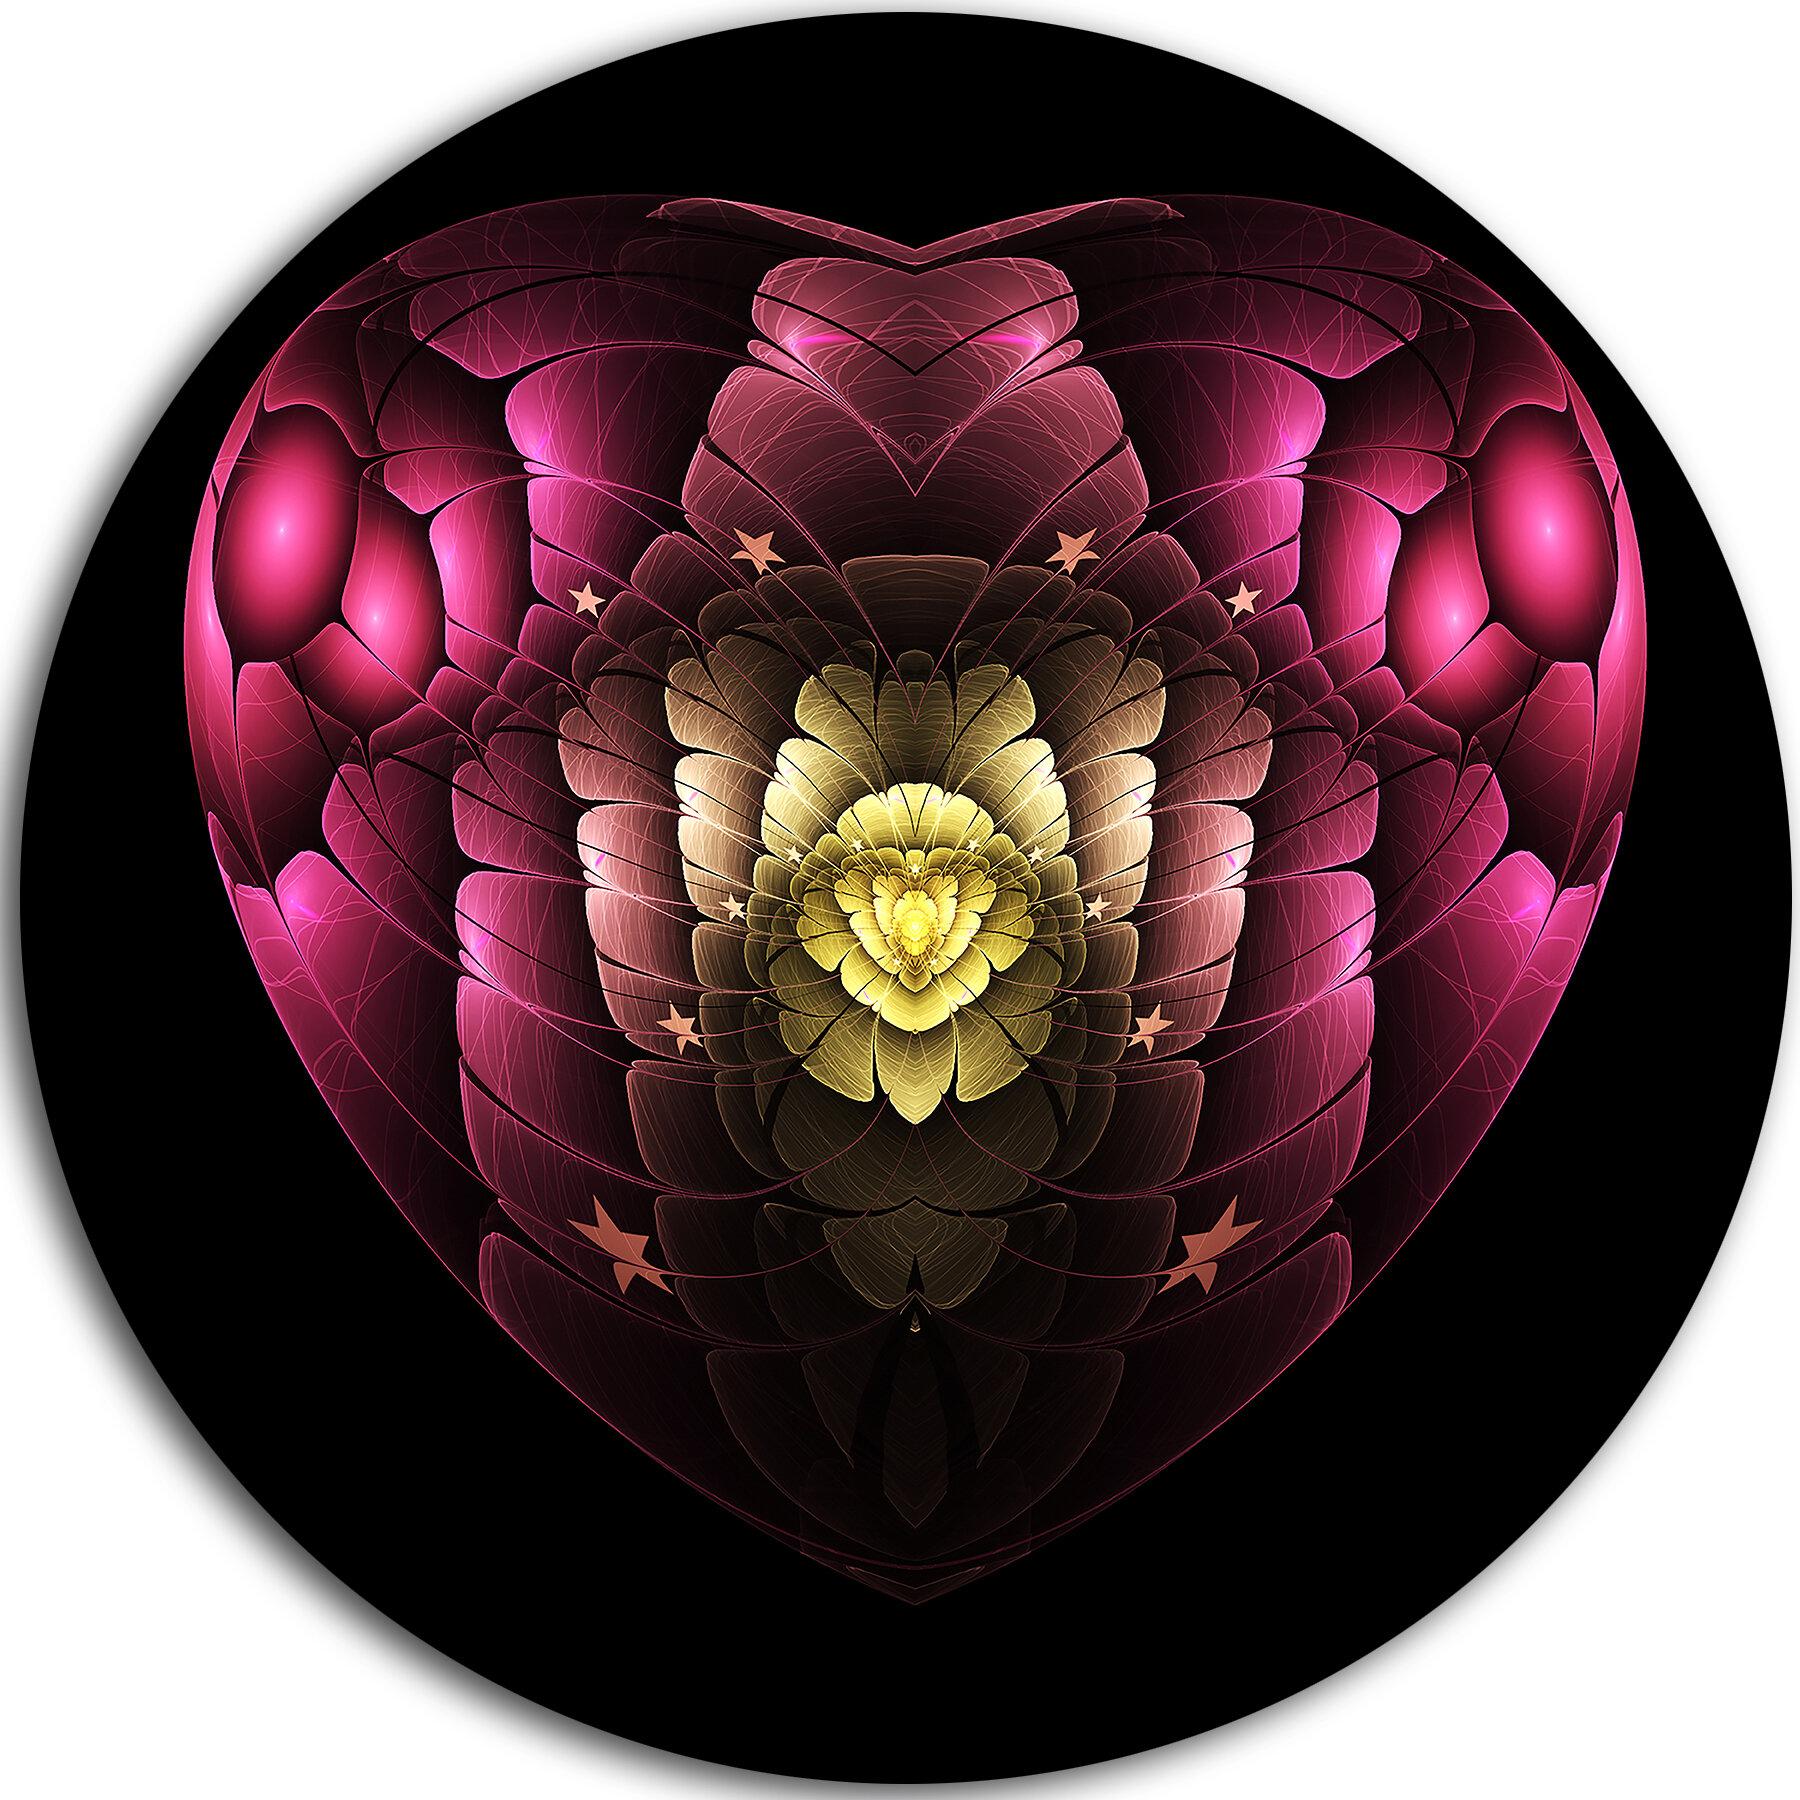 Designart Isolated Heart Digital Art Fractal Flower Graphic Art Print On Metal Wayfair